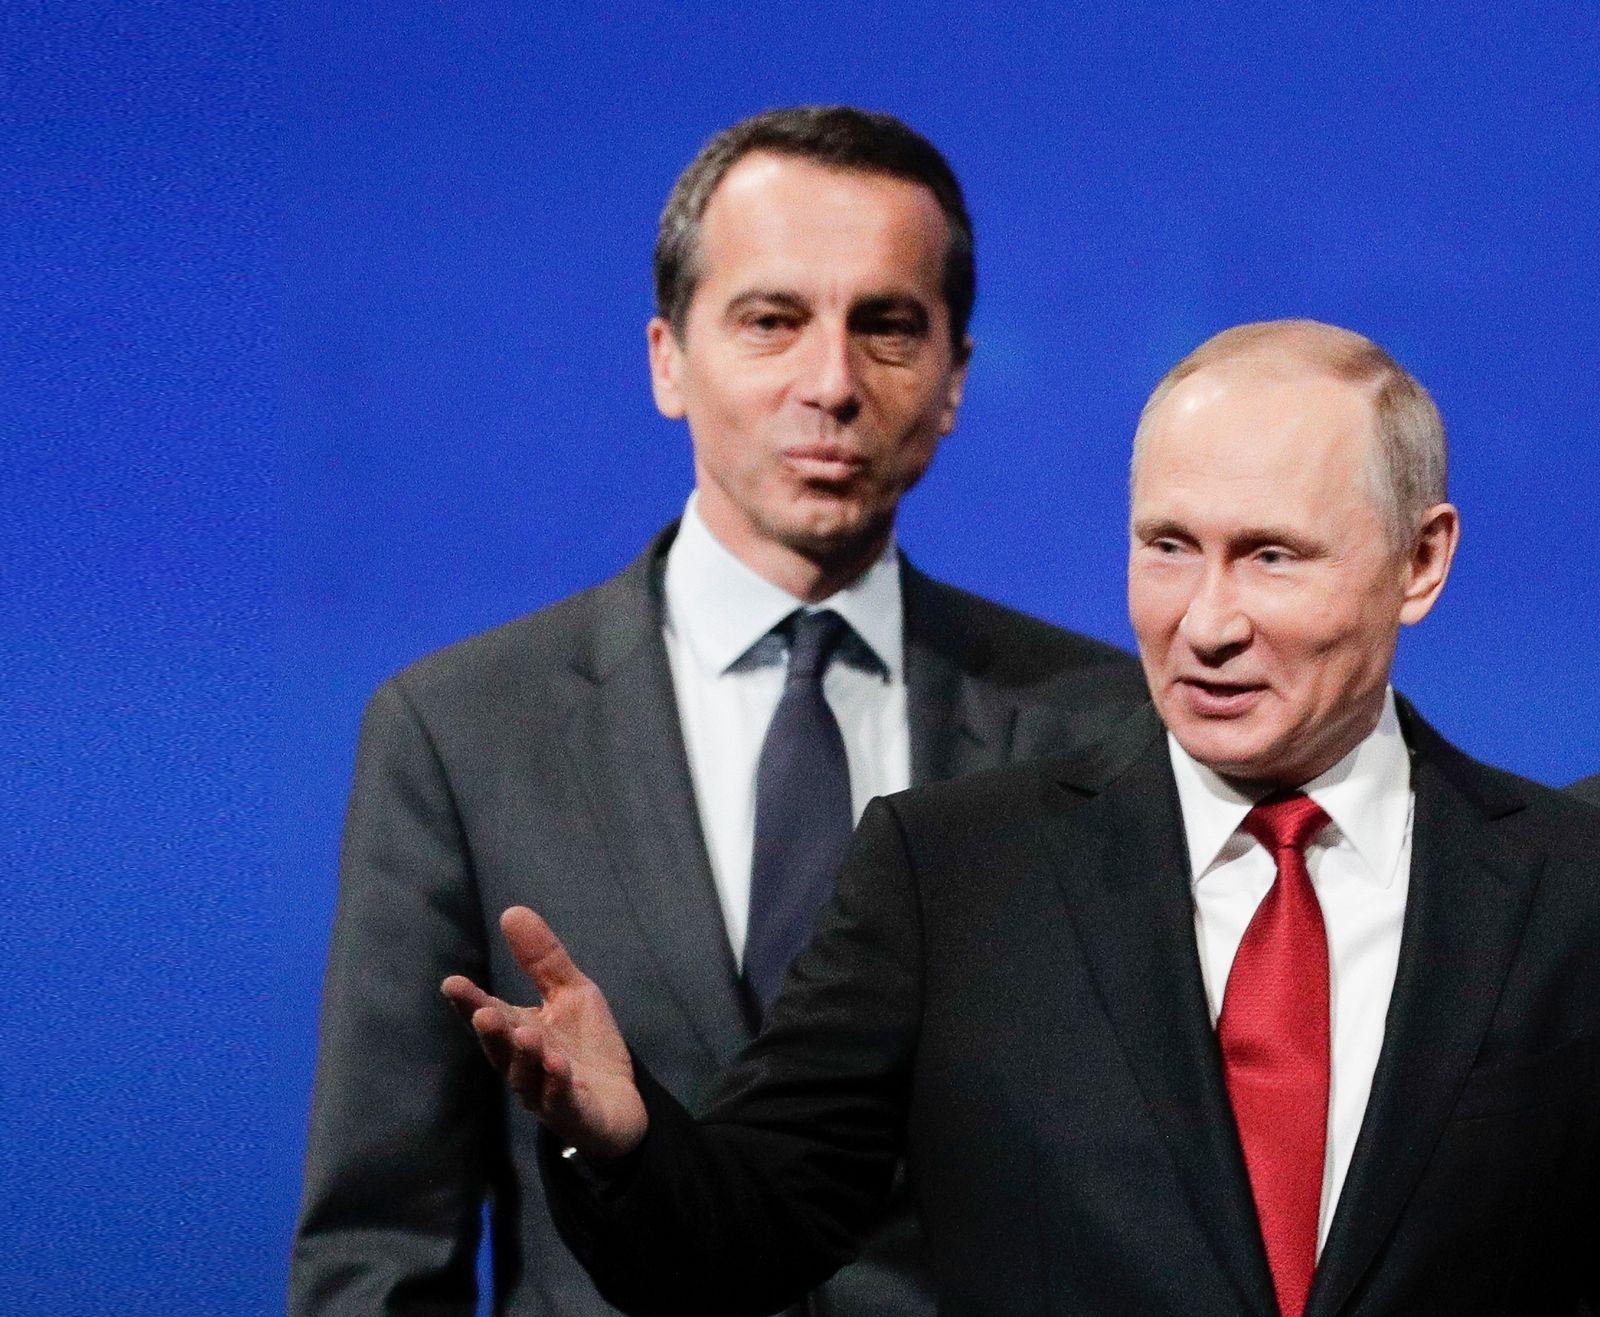 Vladimir Putin / Christian Kerm